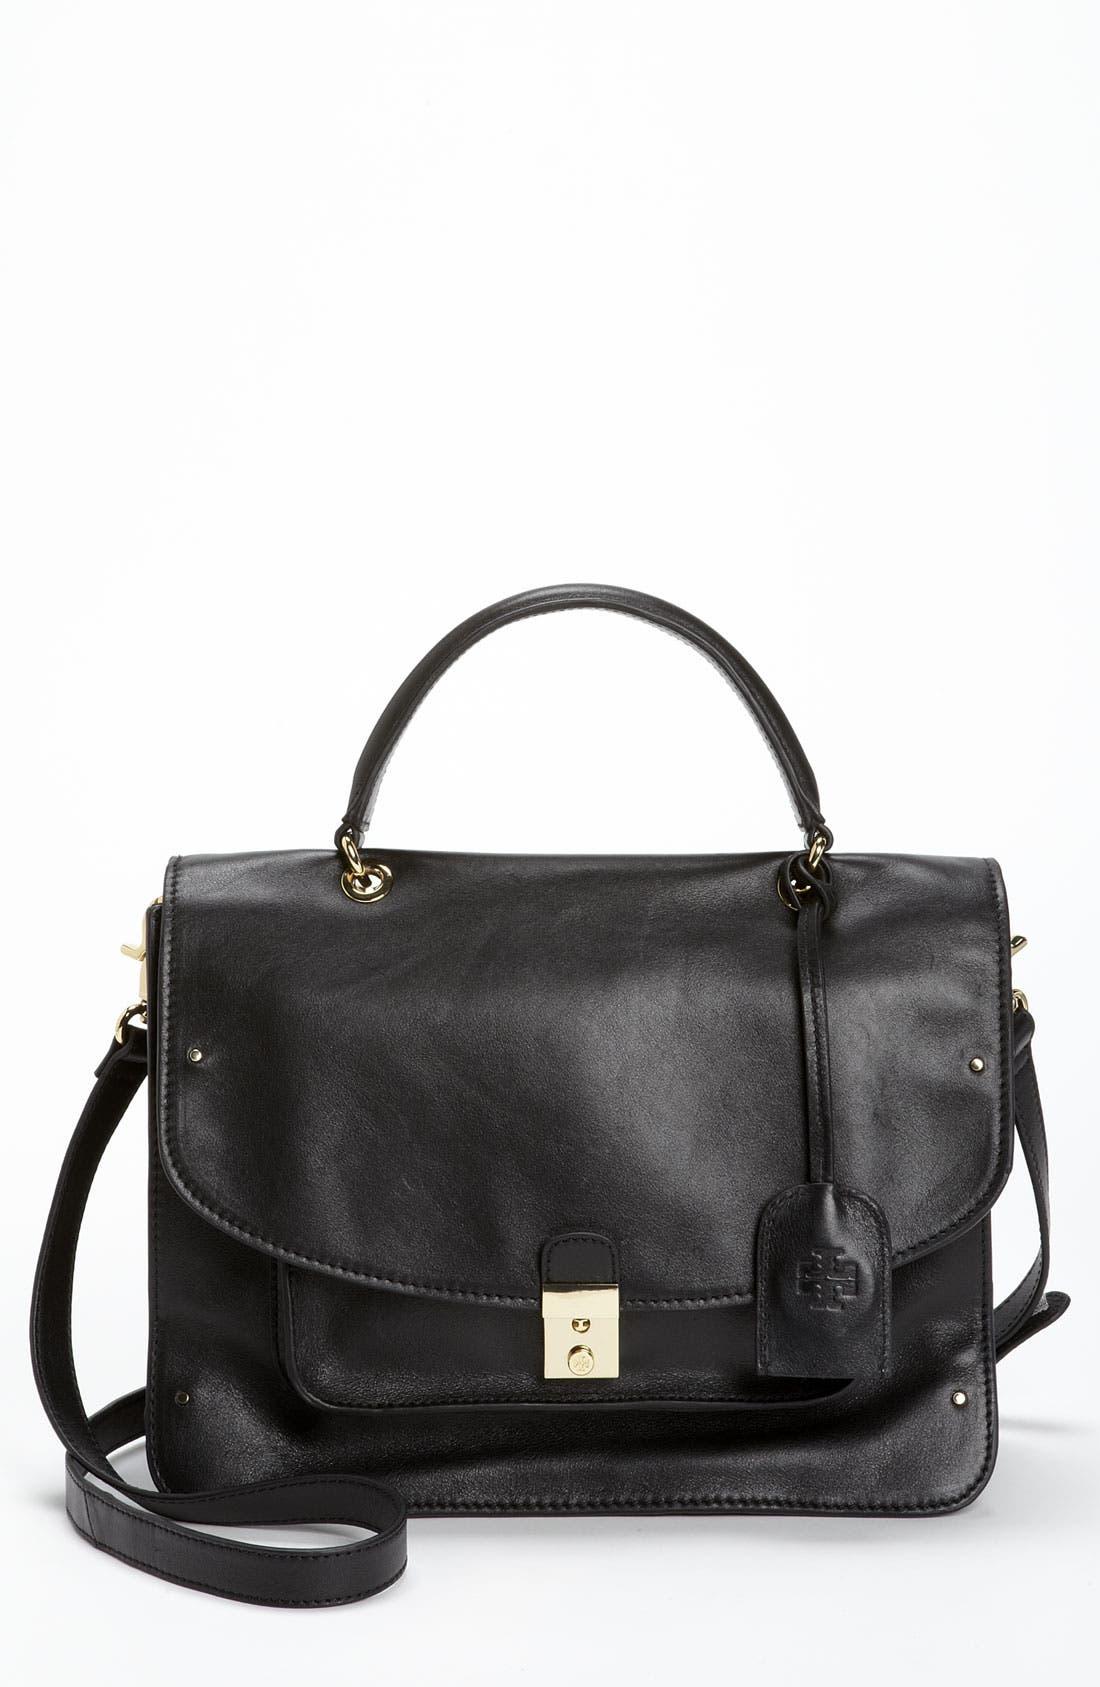 Main Image - Tory Burch 'Priscilla' Crossbody Bag